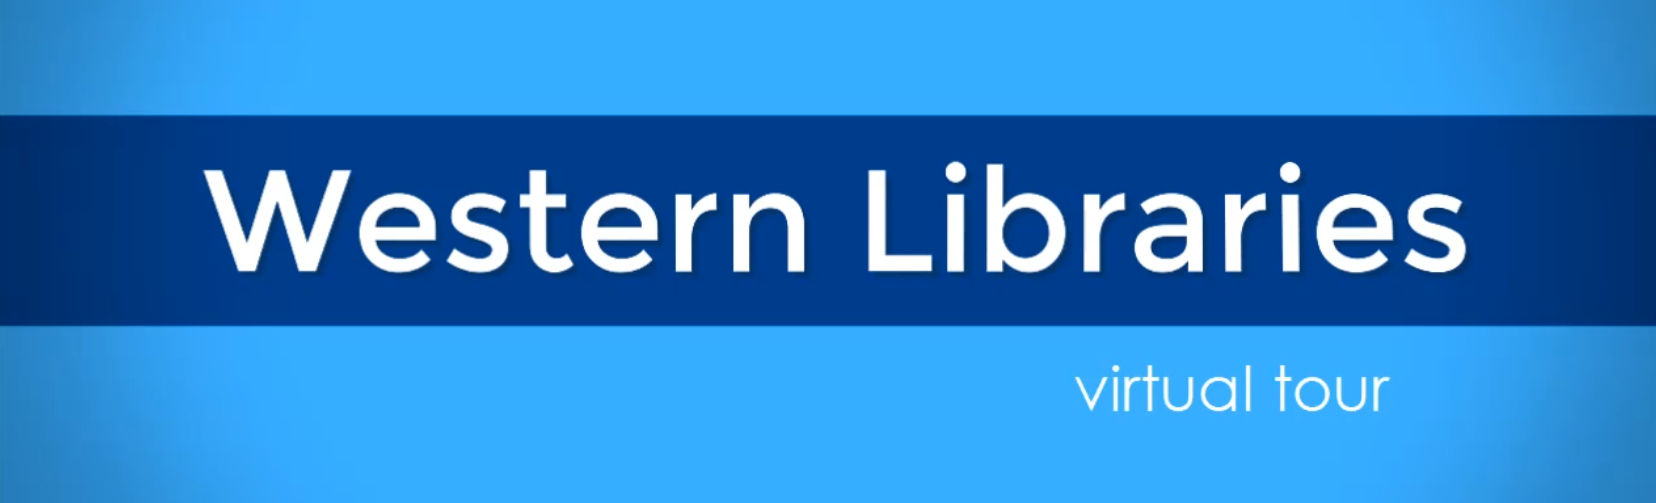 Western Libraries Virtual Tour